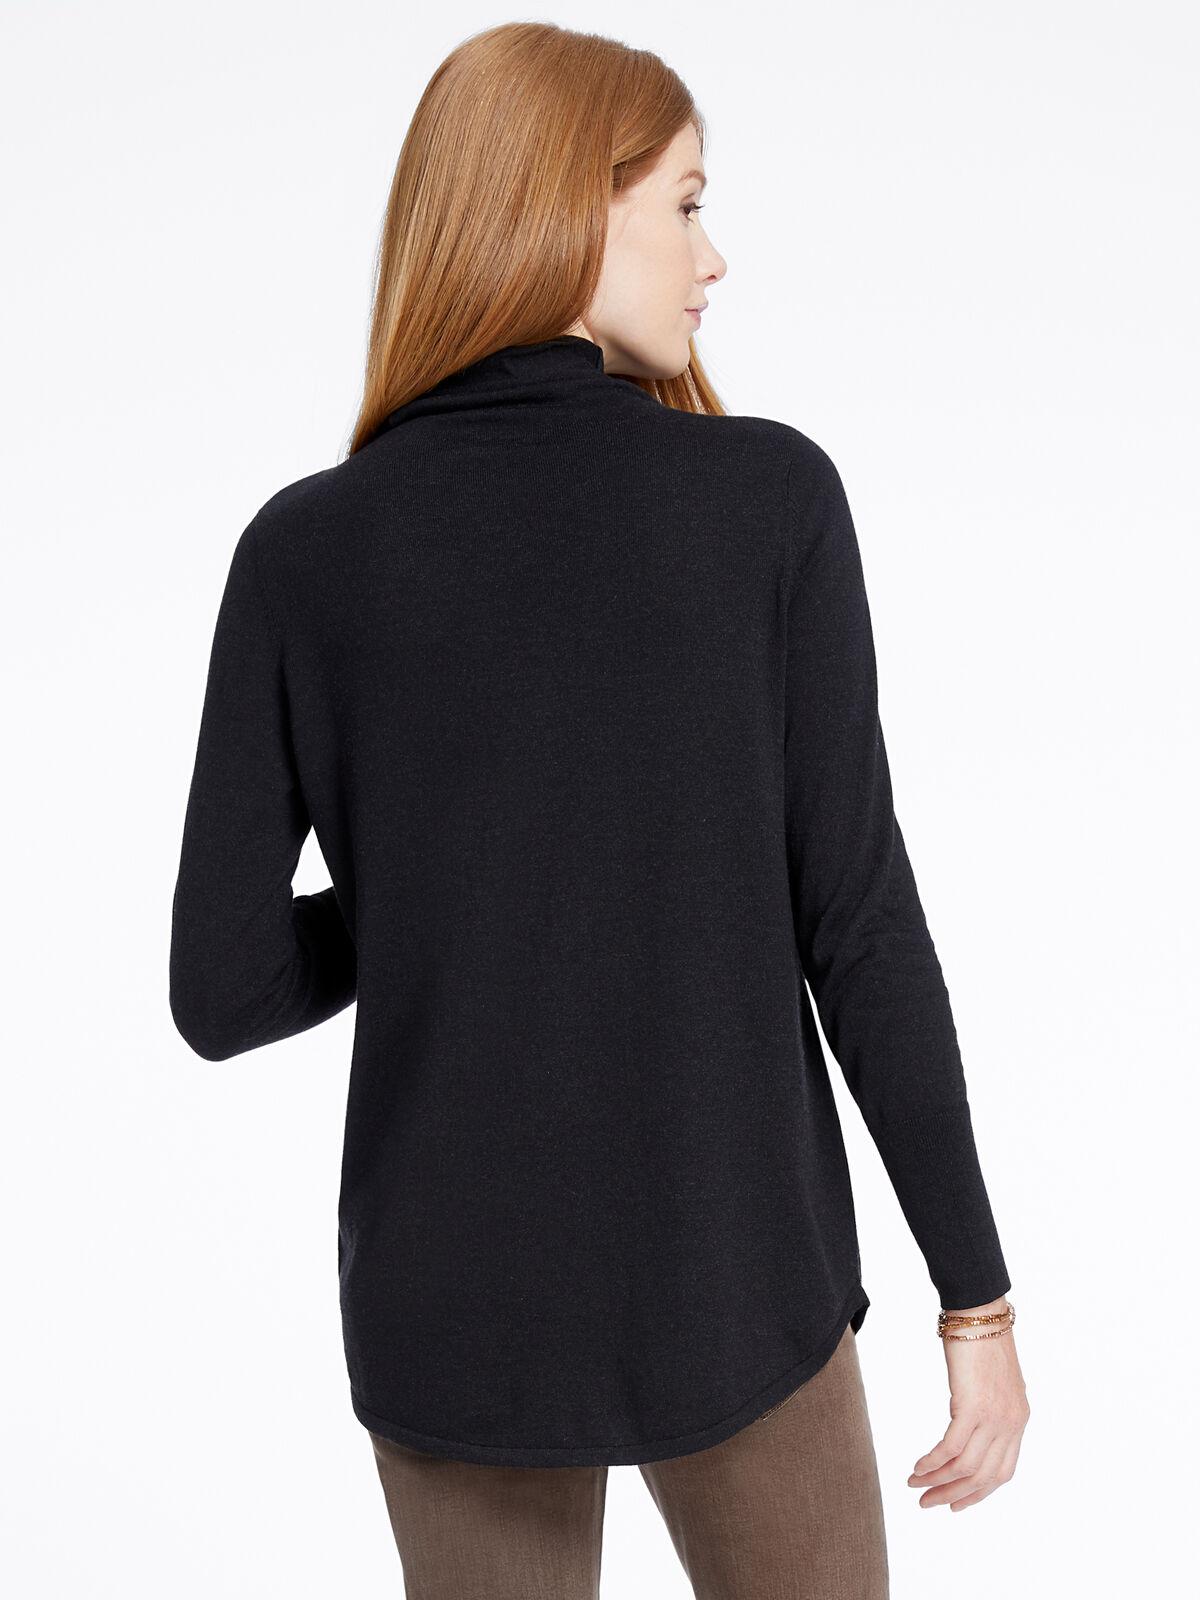 It Item Turtleneck Sweater